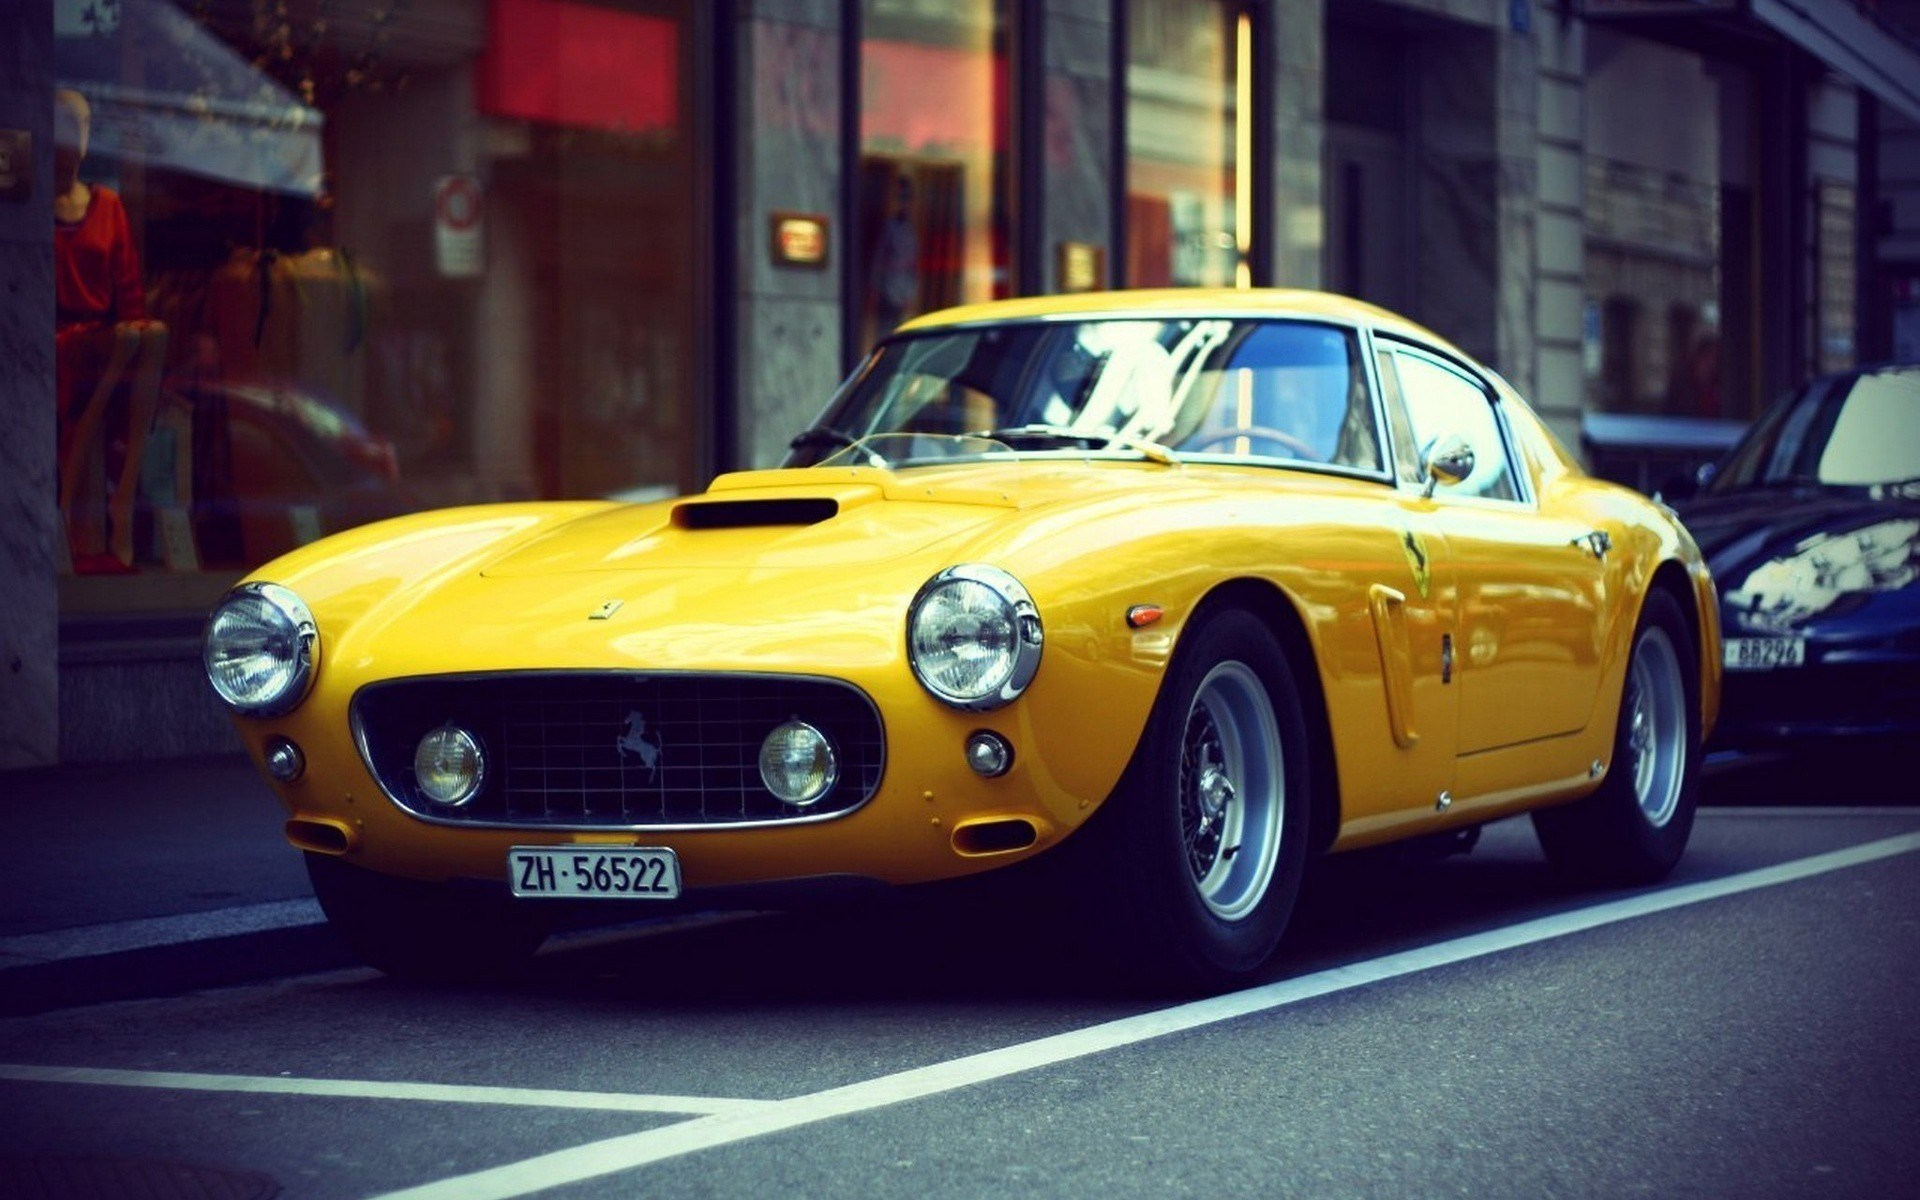 44+ HD Wallpapers Classic Cars on WallpaperSafari